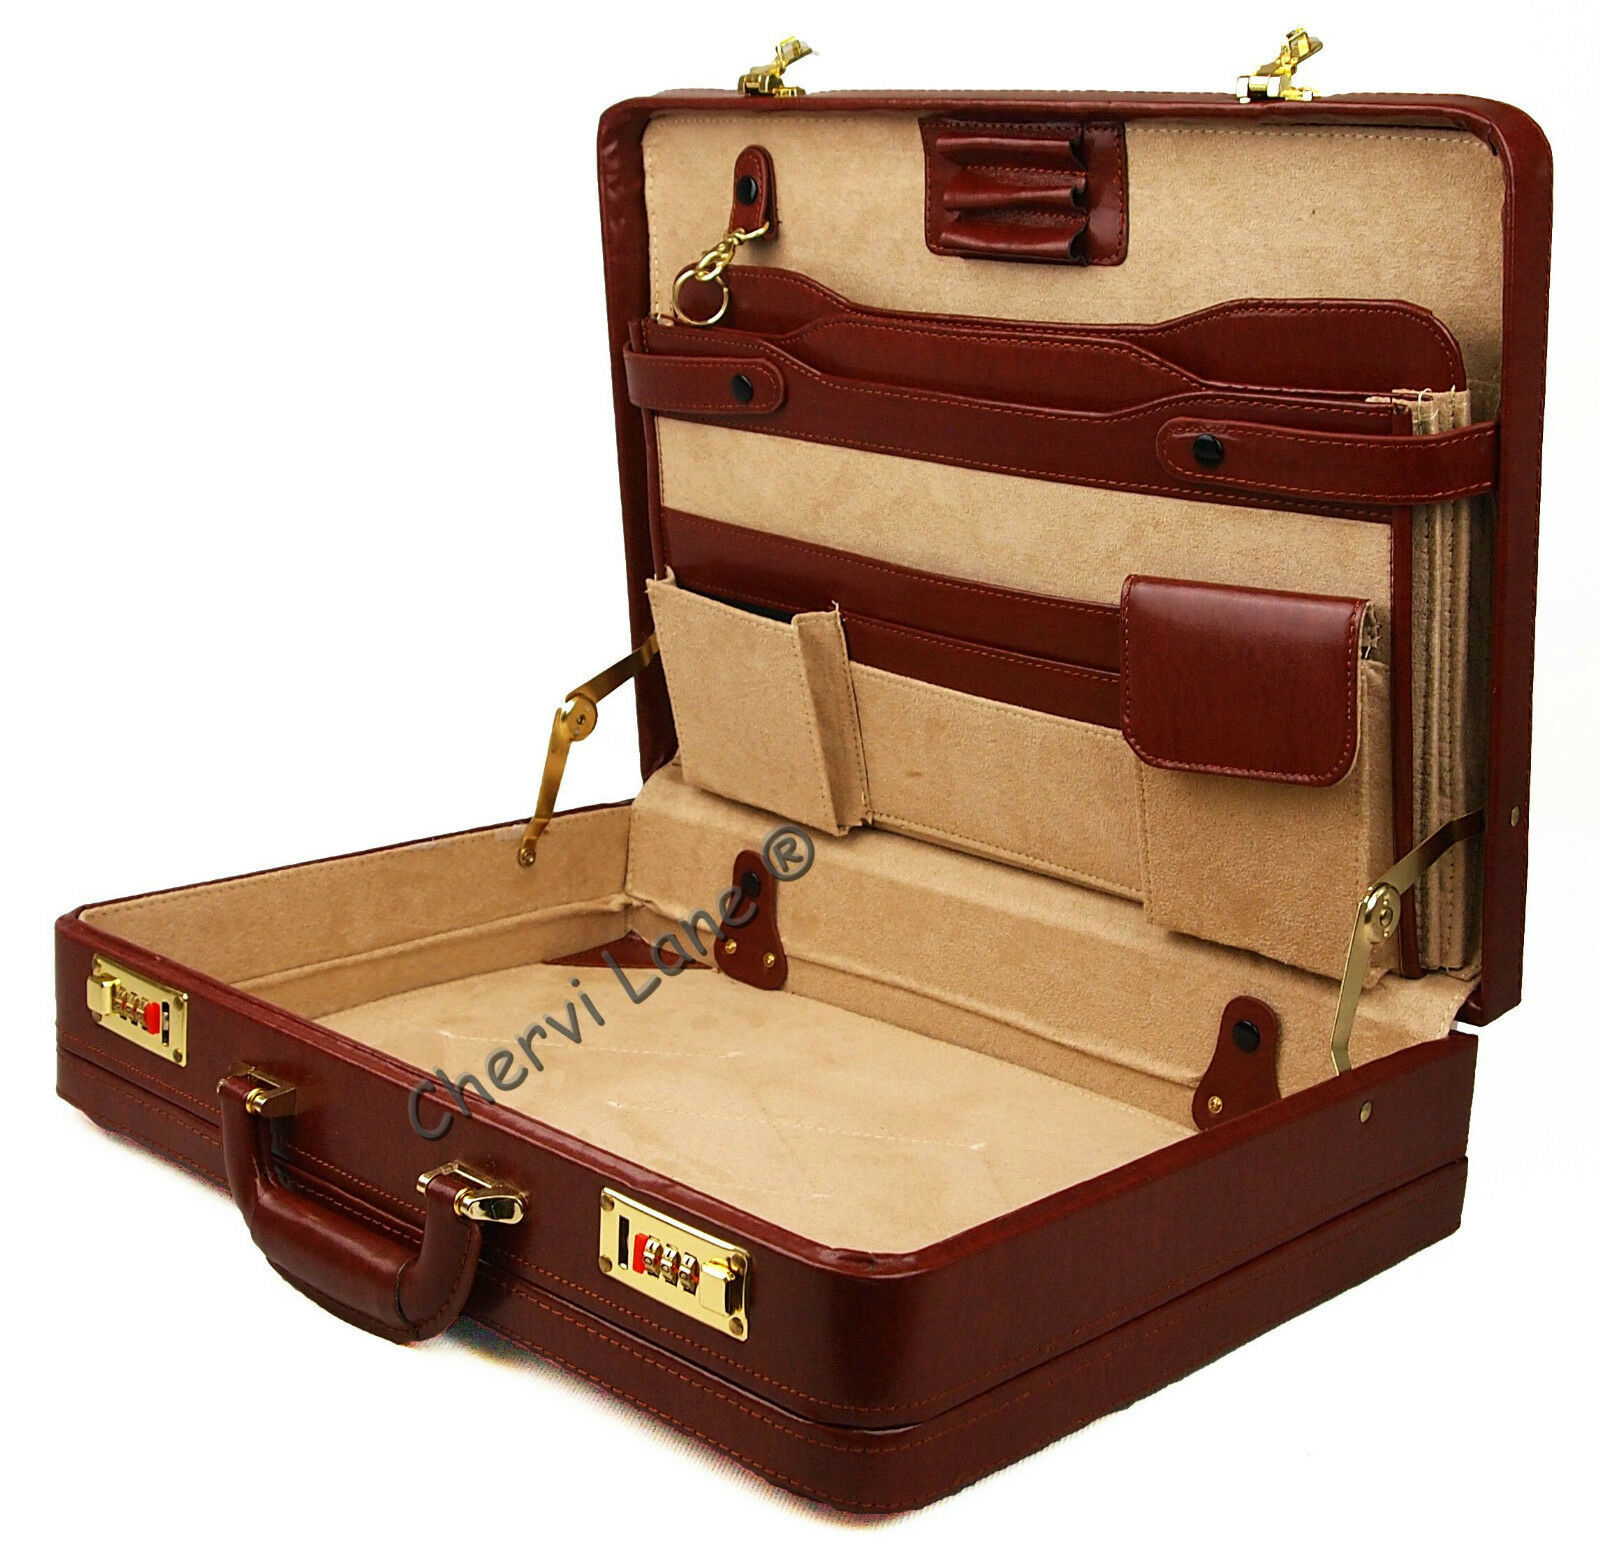 High High High Quality Genuine Leather Briefcase Executive Business Bag Work Briefcase New | Clever und praktisch  fe5d3e